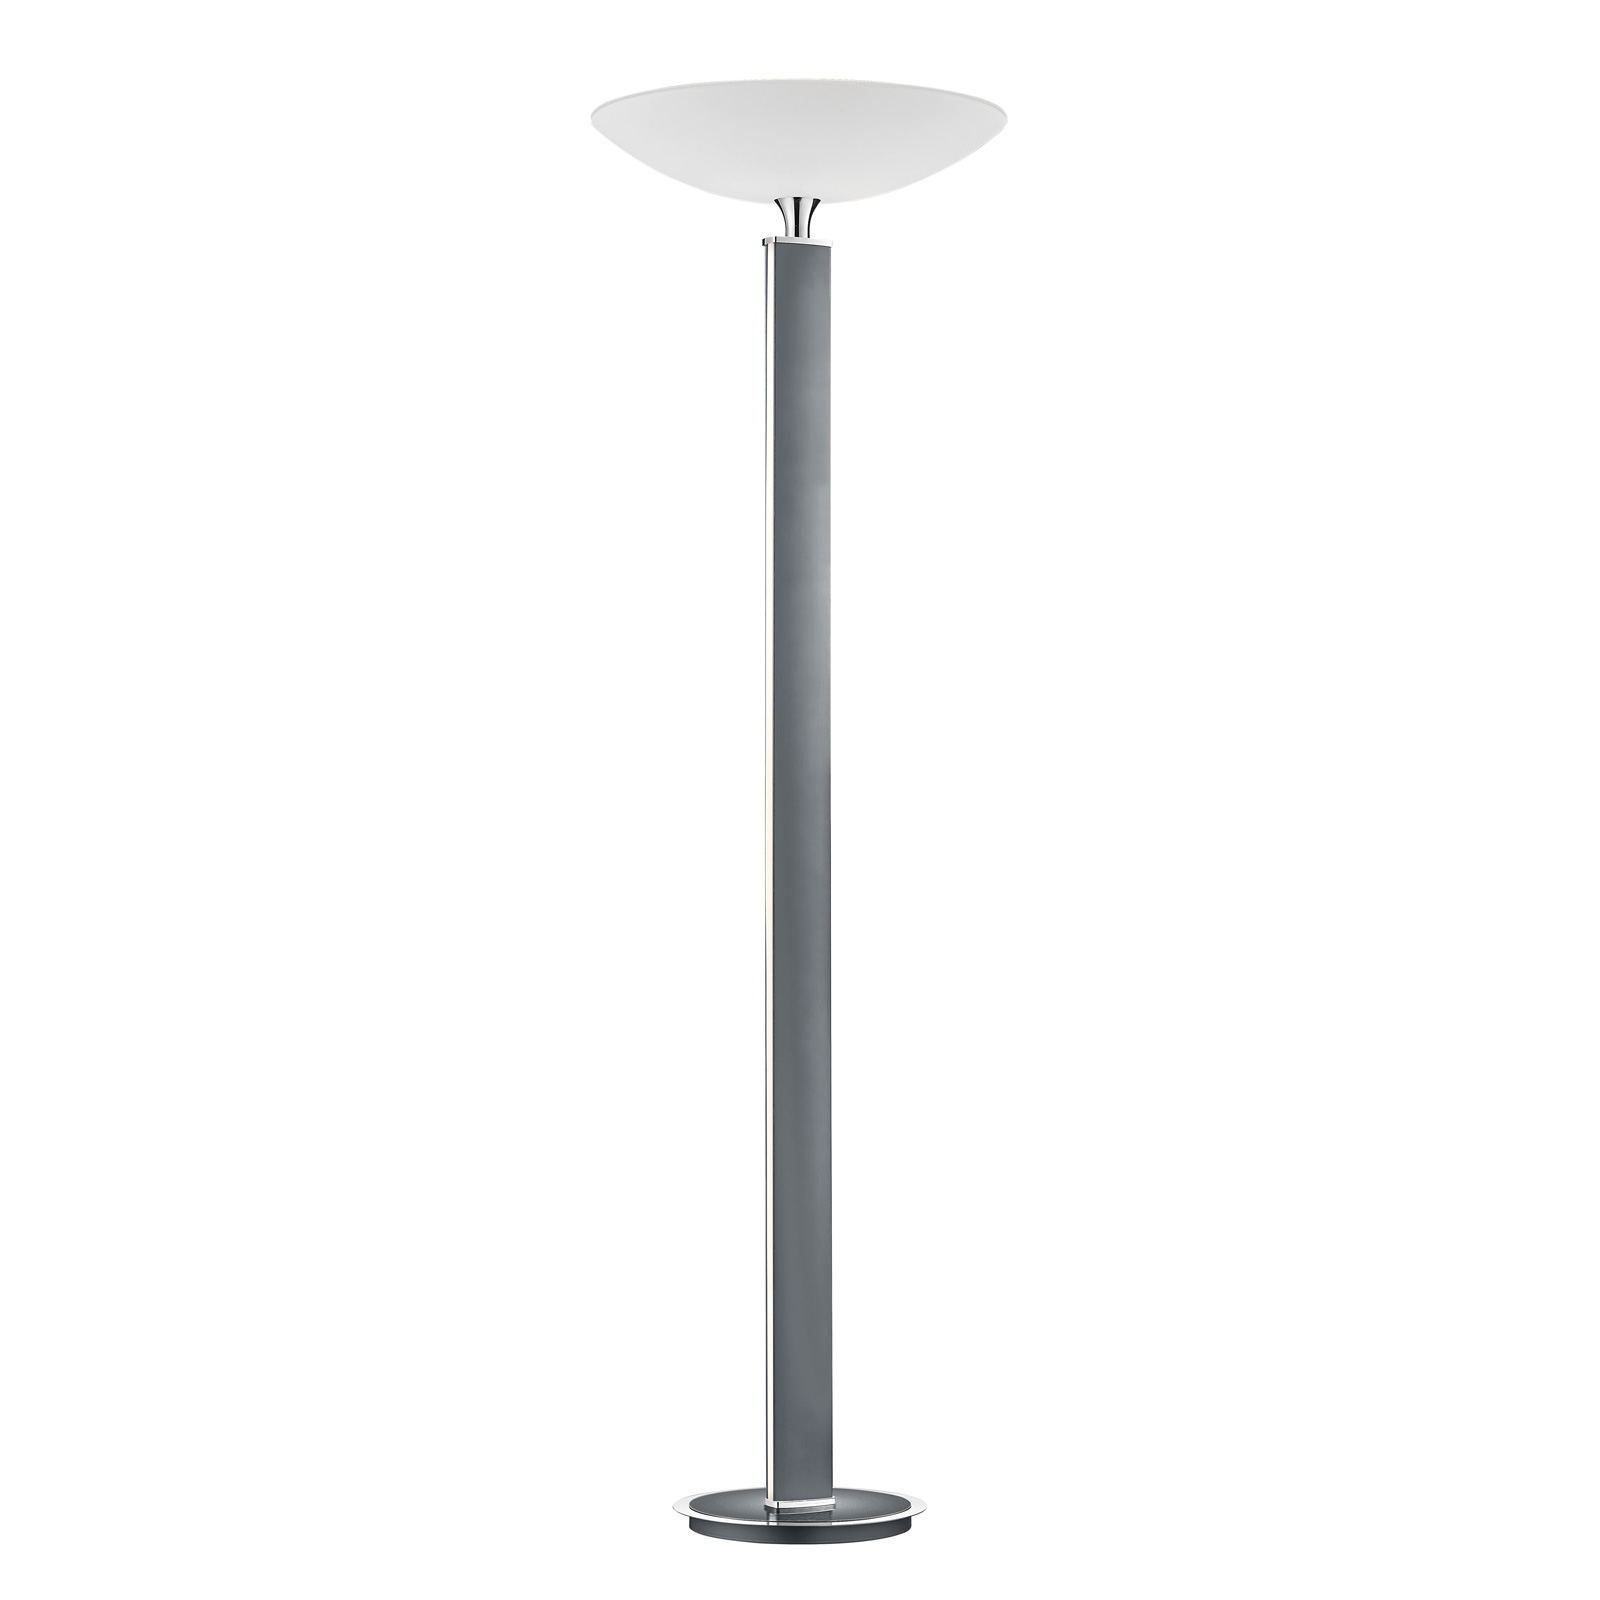 BANKAMP Pure F LED-Deckenfluter, anthrazit